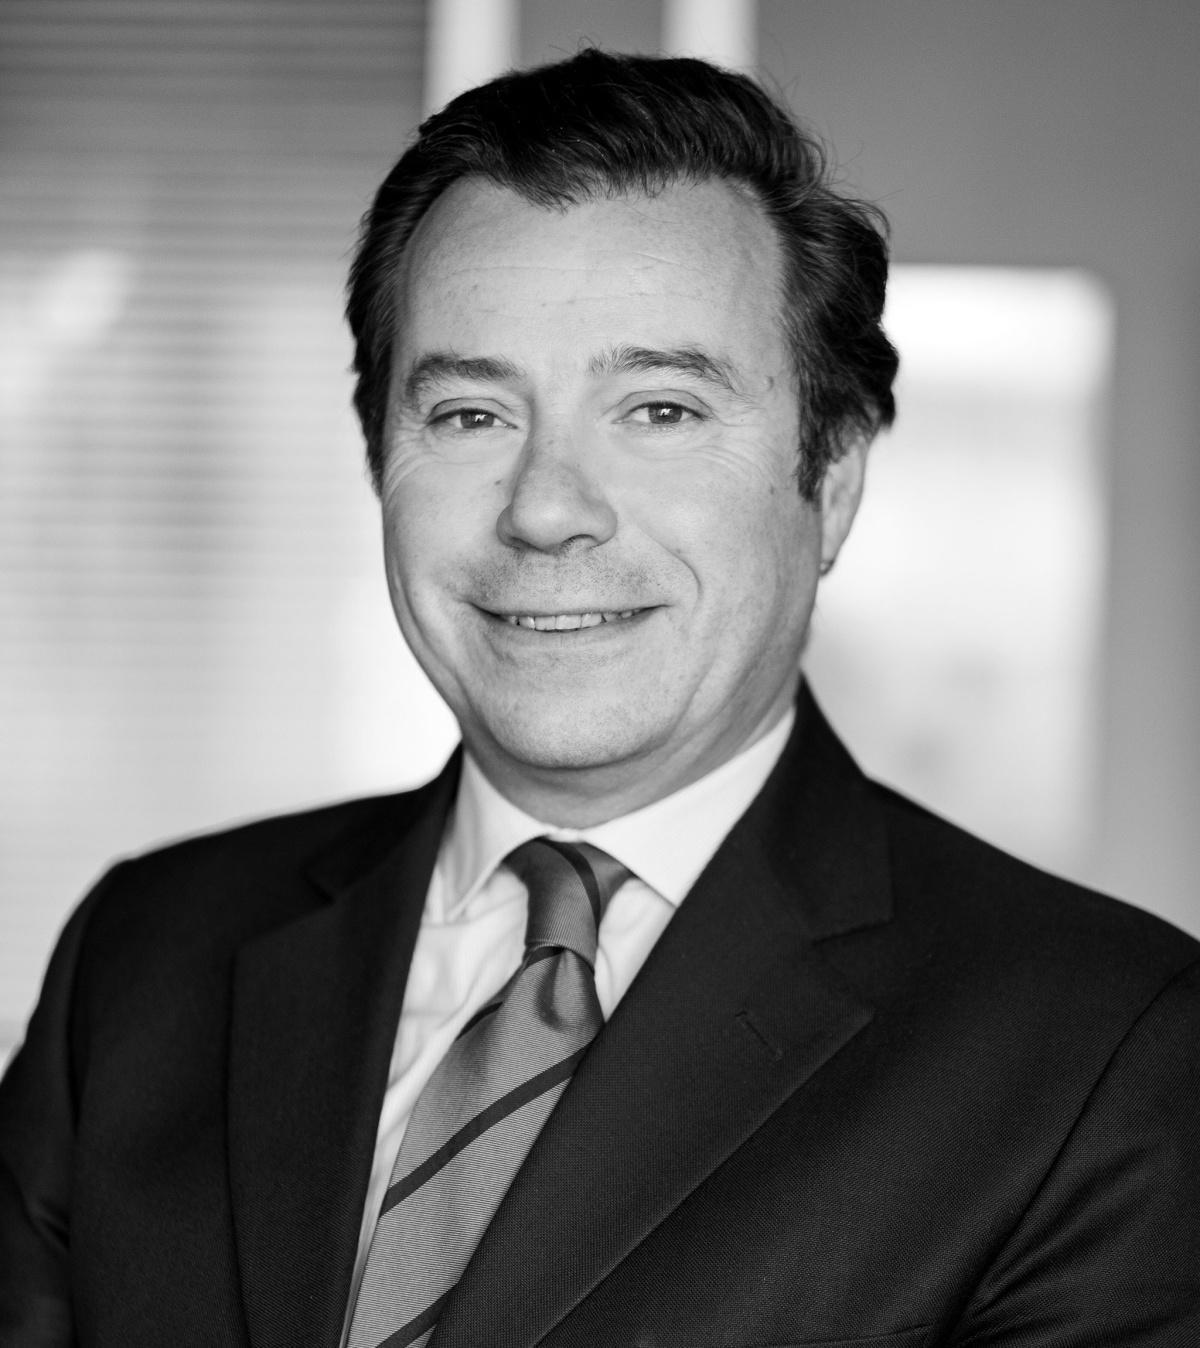 Benoit Rigot